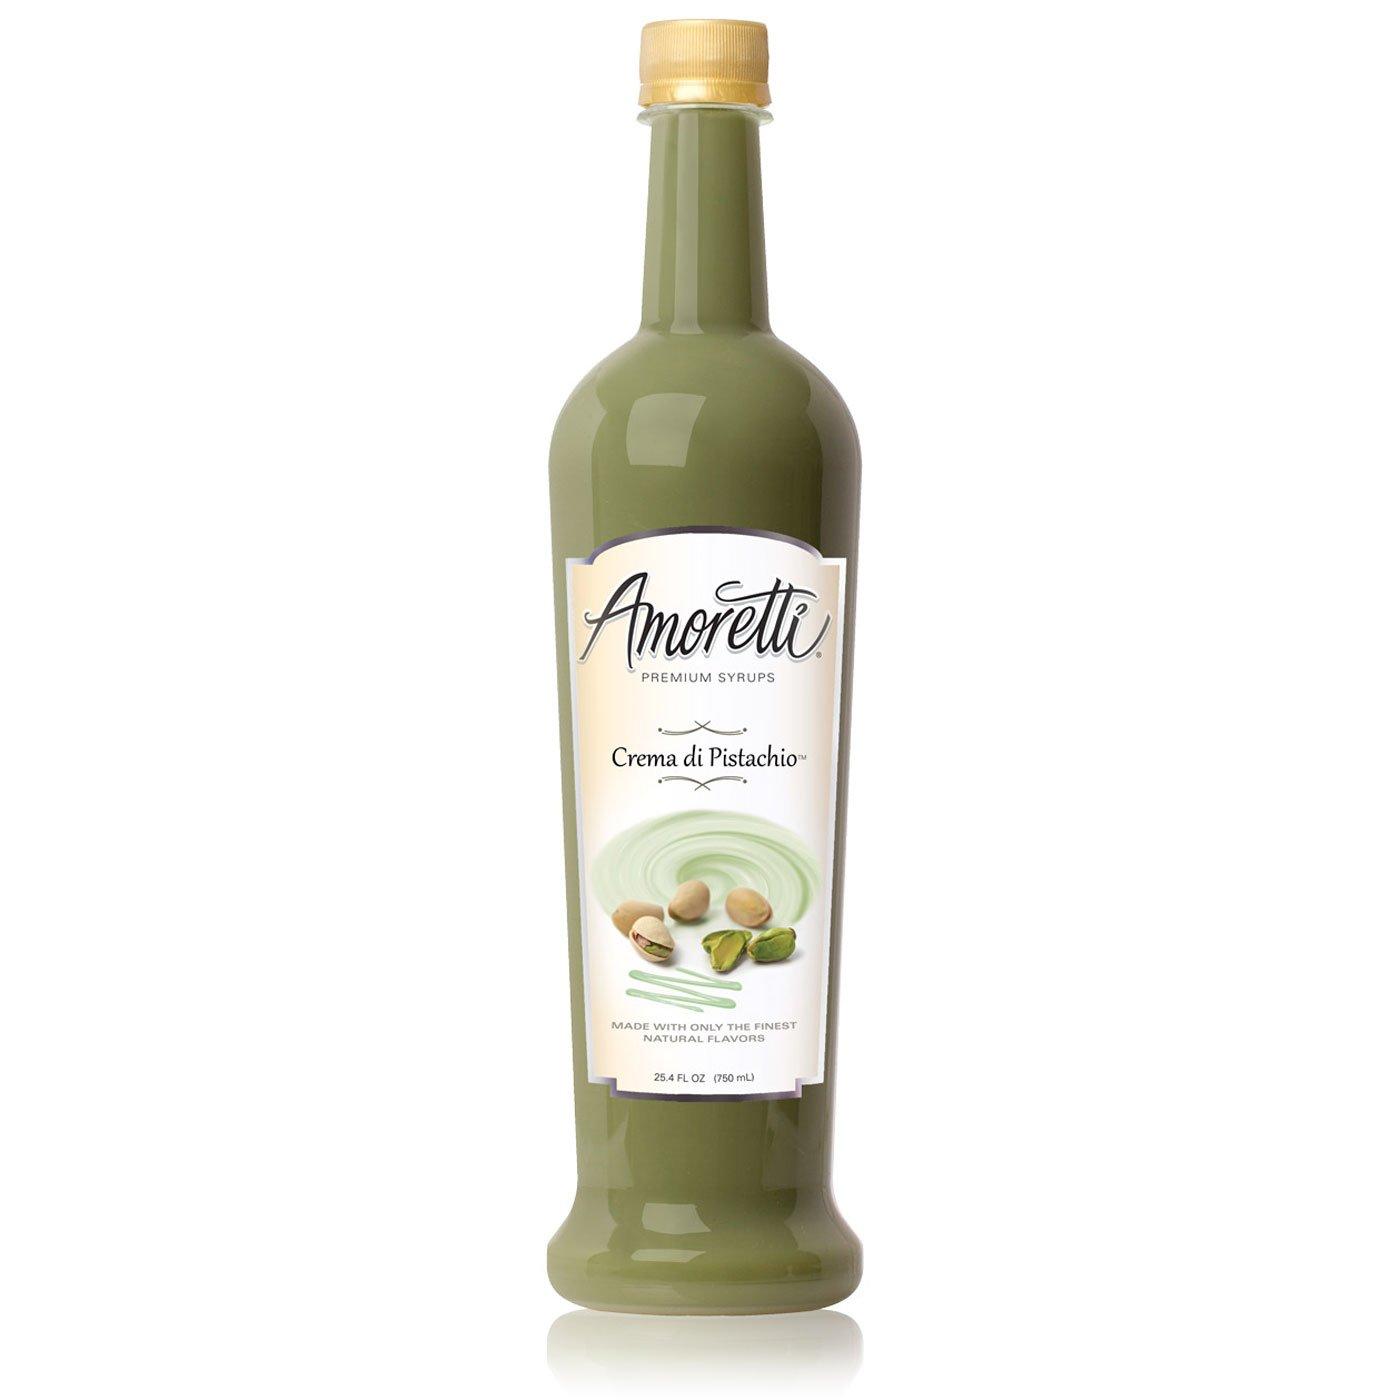 Amoretti Premium Syrup Crema Di of Pack shopping Pistachio 25.4 Trust Ounce